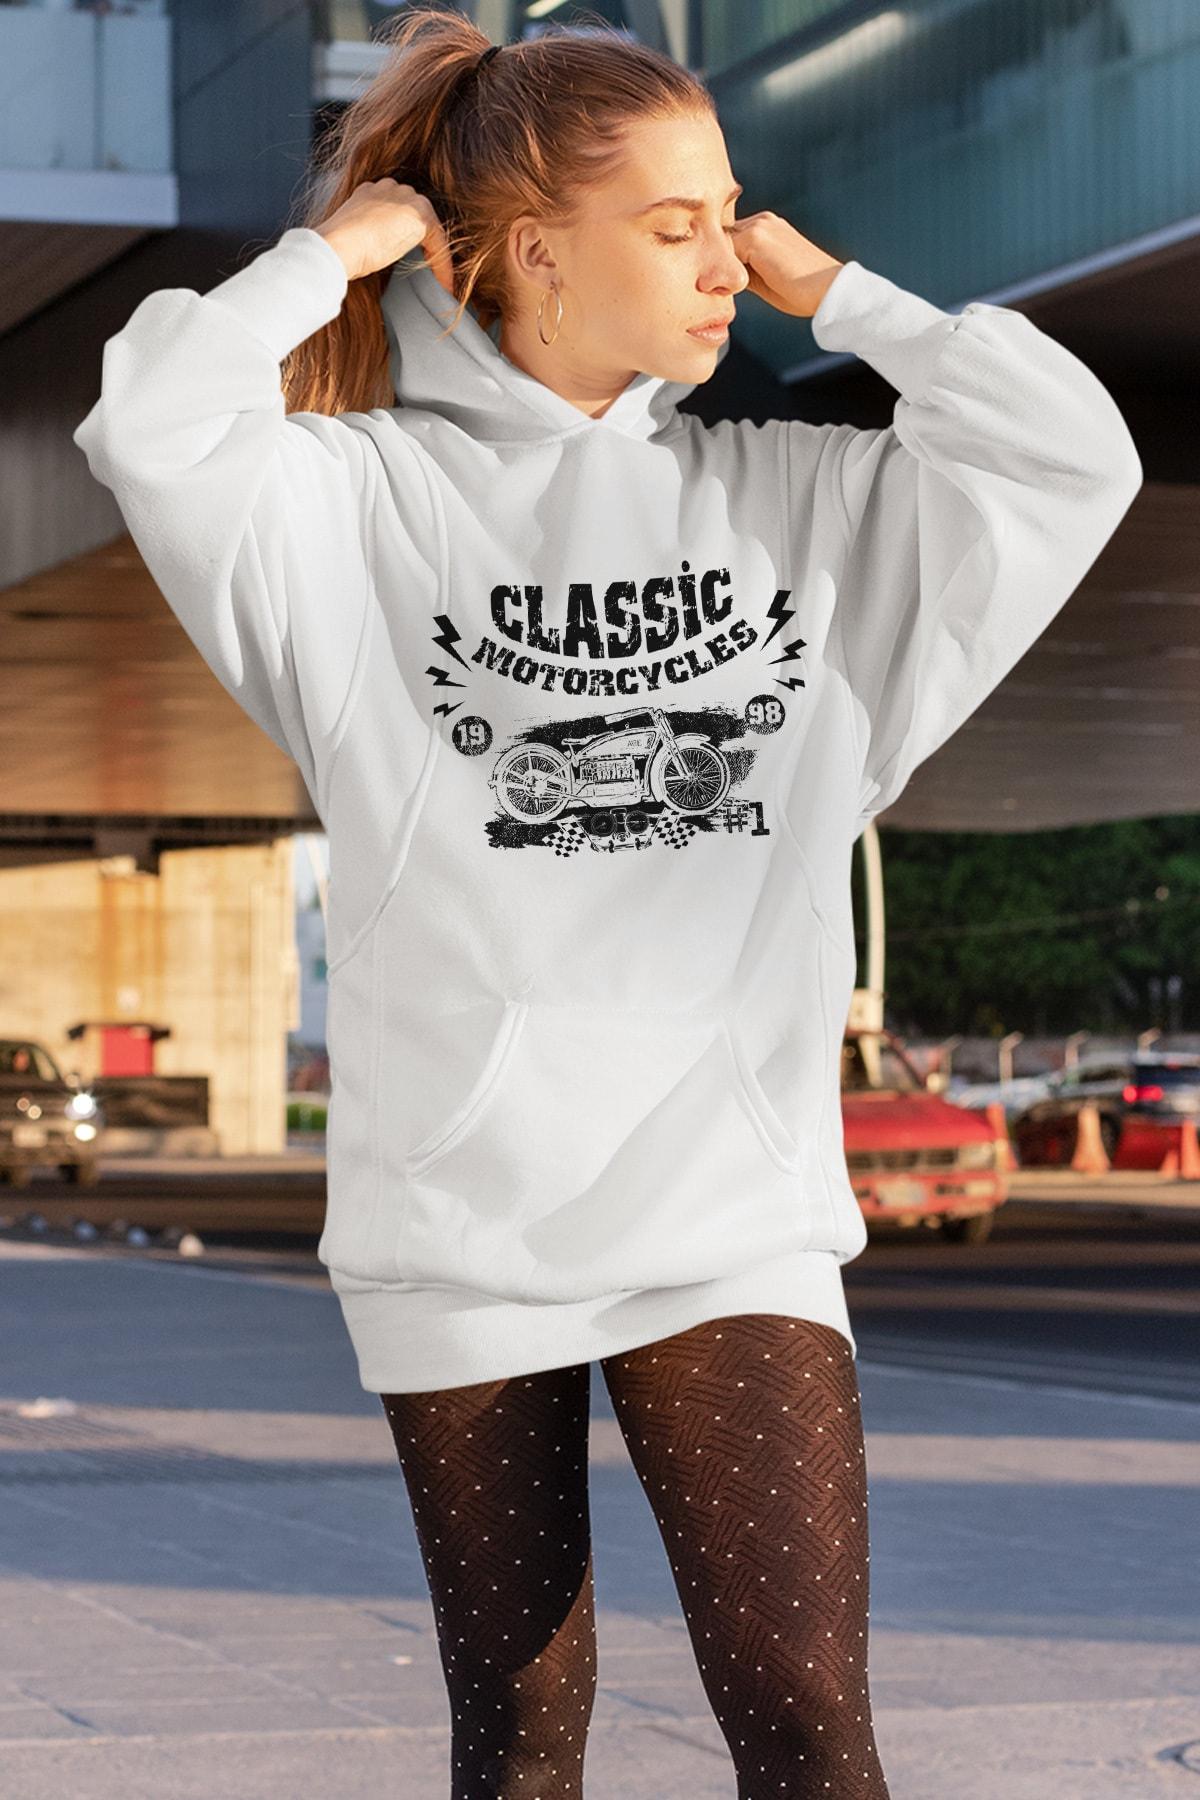 Wear Motorcycles Beyaz Elbise Sweatshirt Tunik